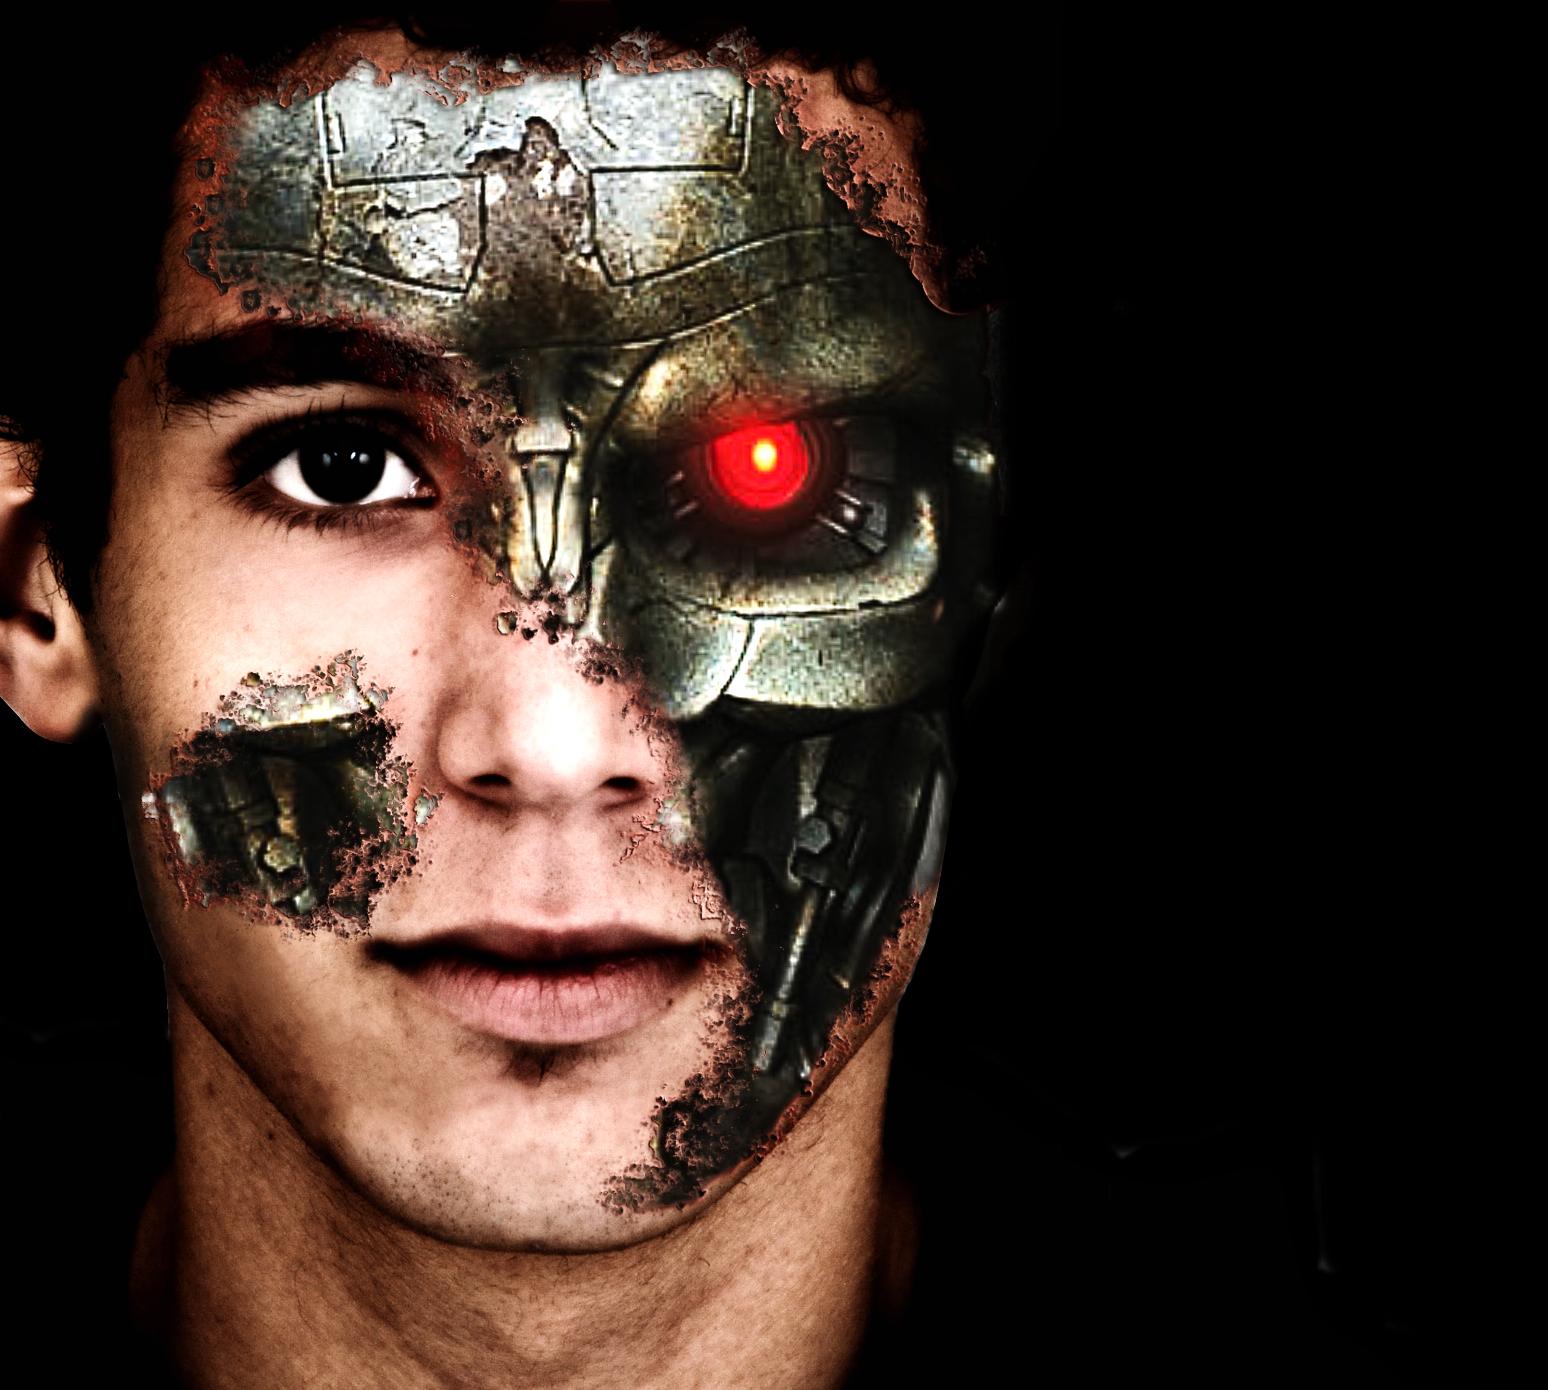 Terminator face by brox023 on DeviantArt